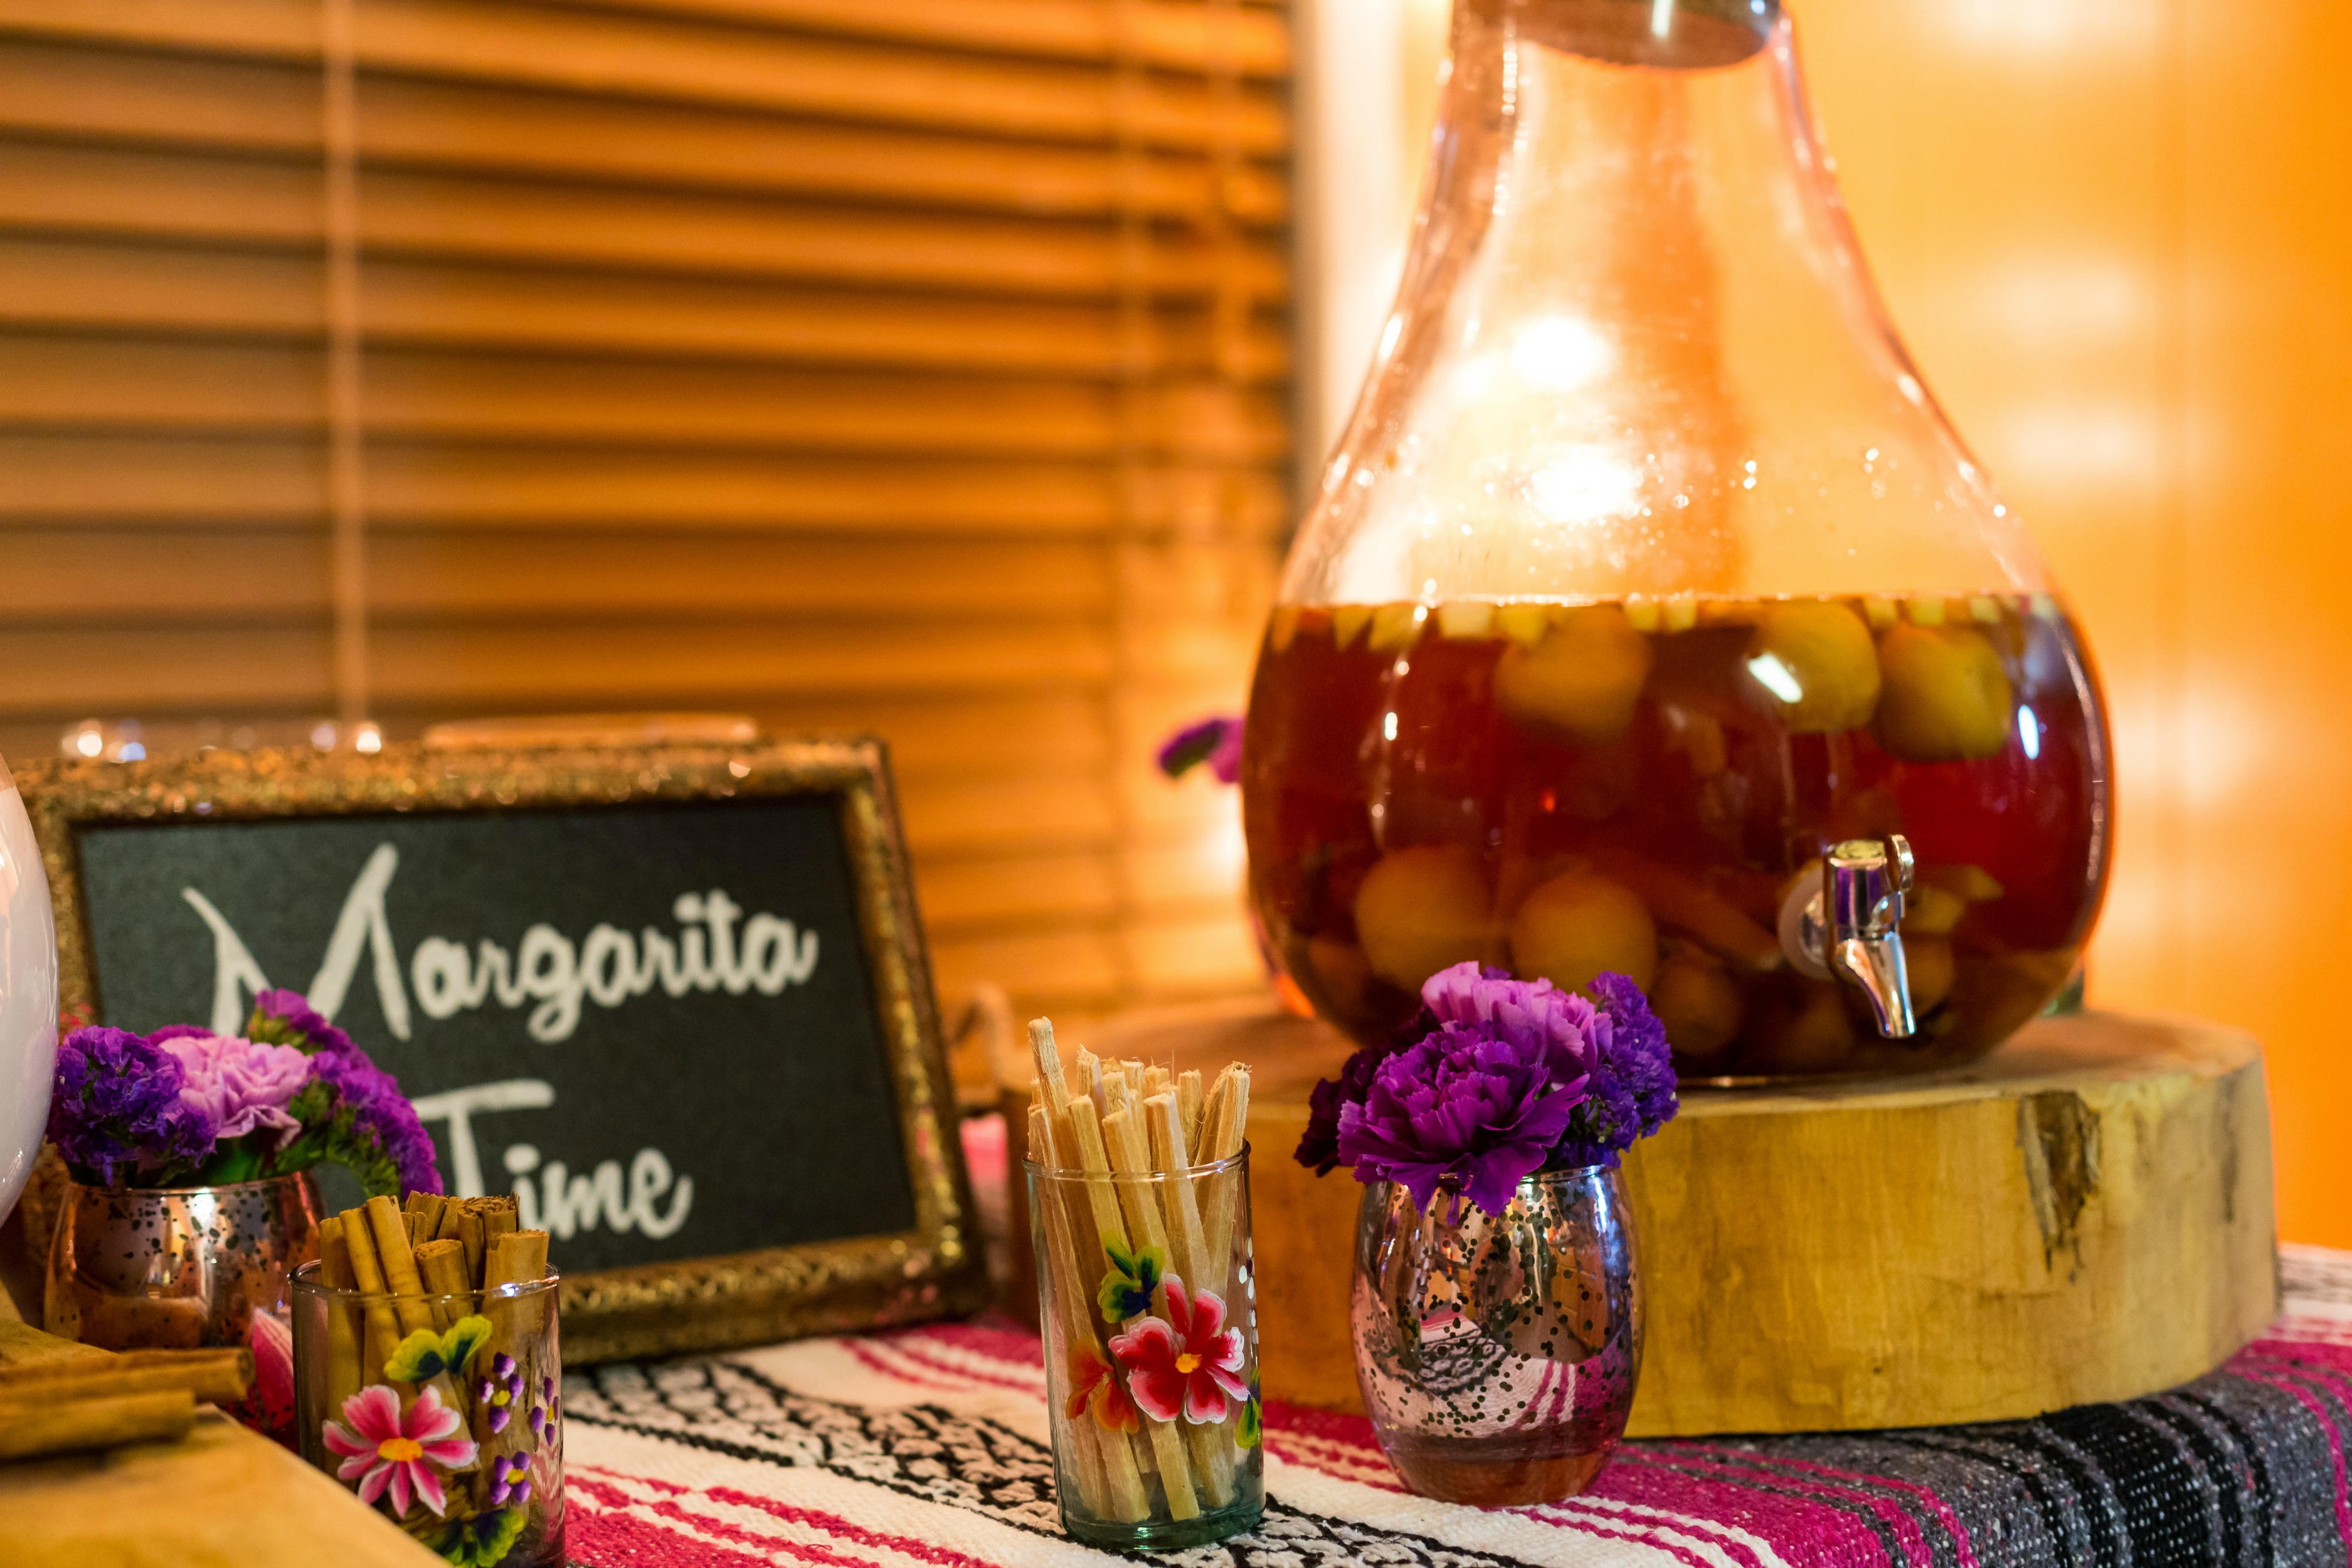 how-to-host-a-tamalada-margarita-bar-vianneyrodriguez-sweetlifebake